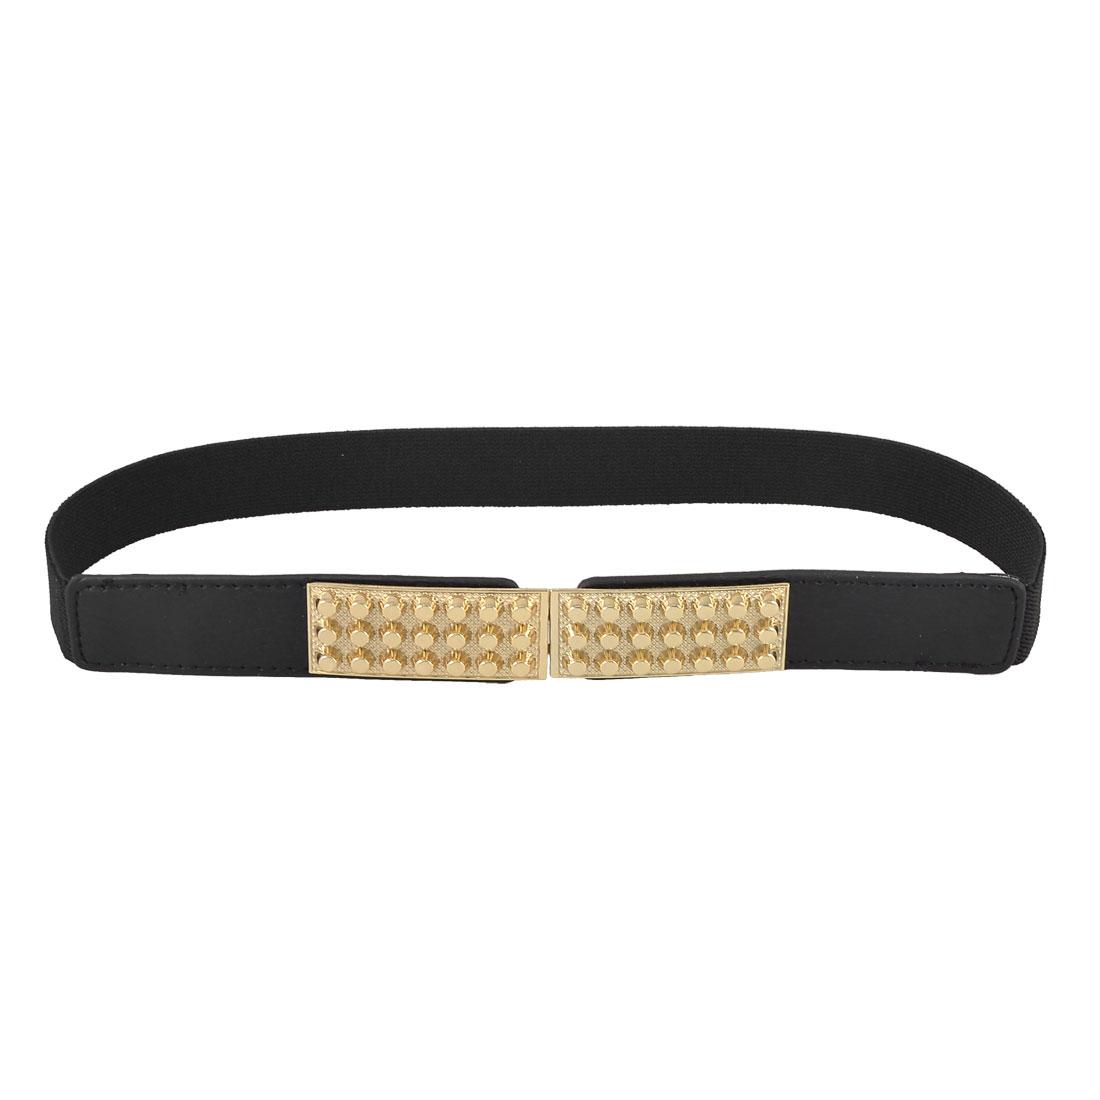 Lady Black Gold Tone Metal Studs Detail Interlocking Buckle Elastic Waist Belt